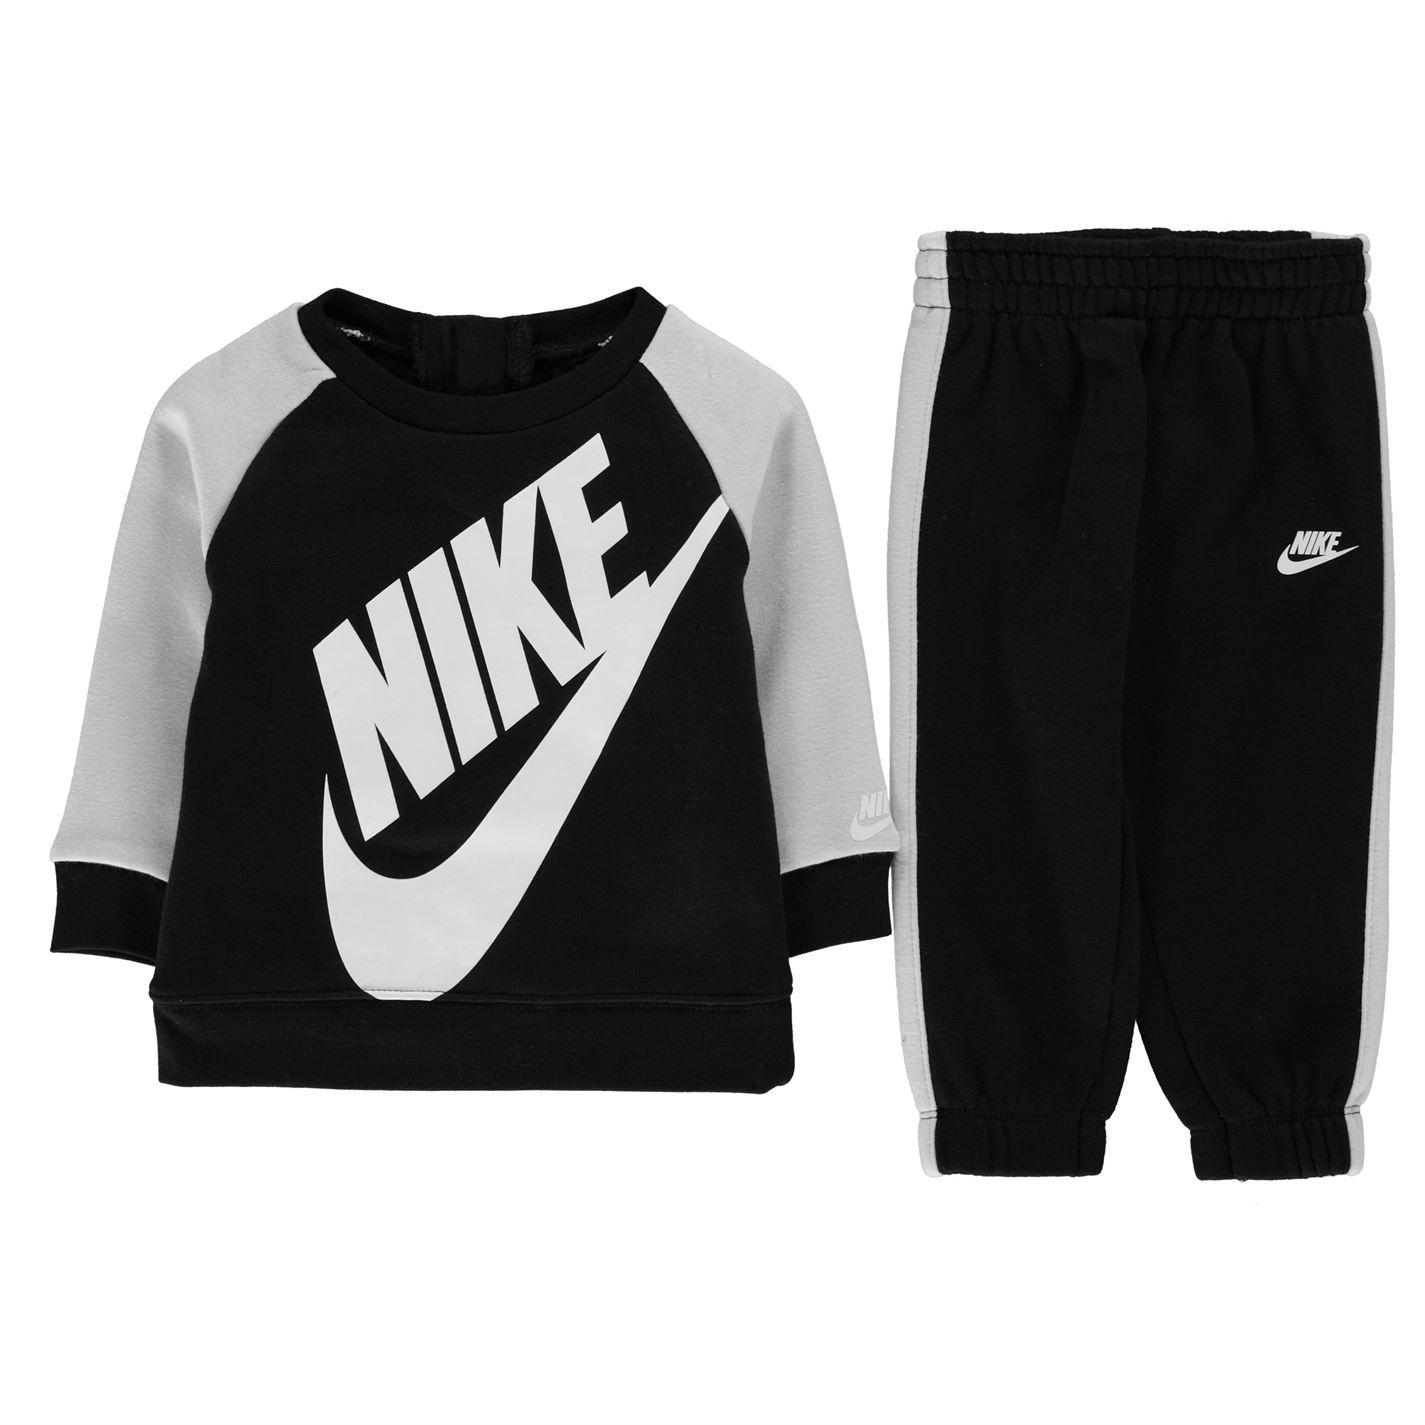 Nike Futura Crew Set Infant Boys